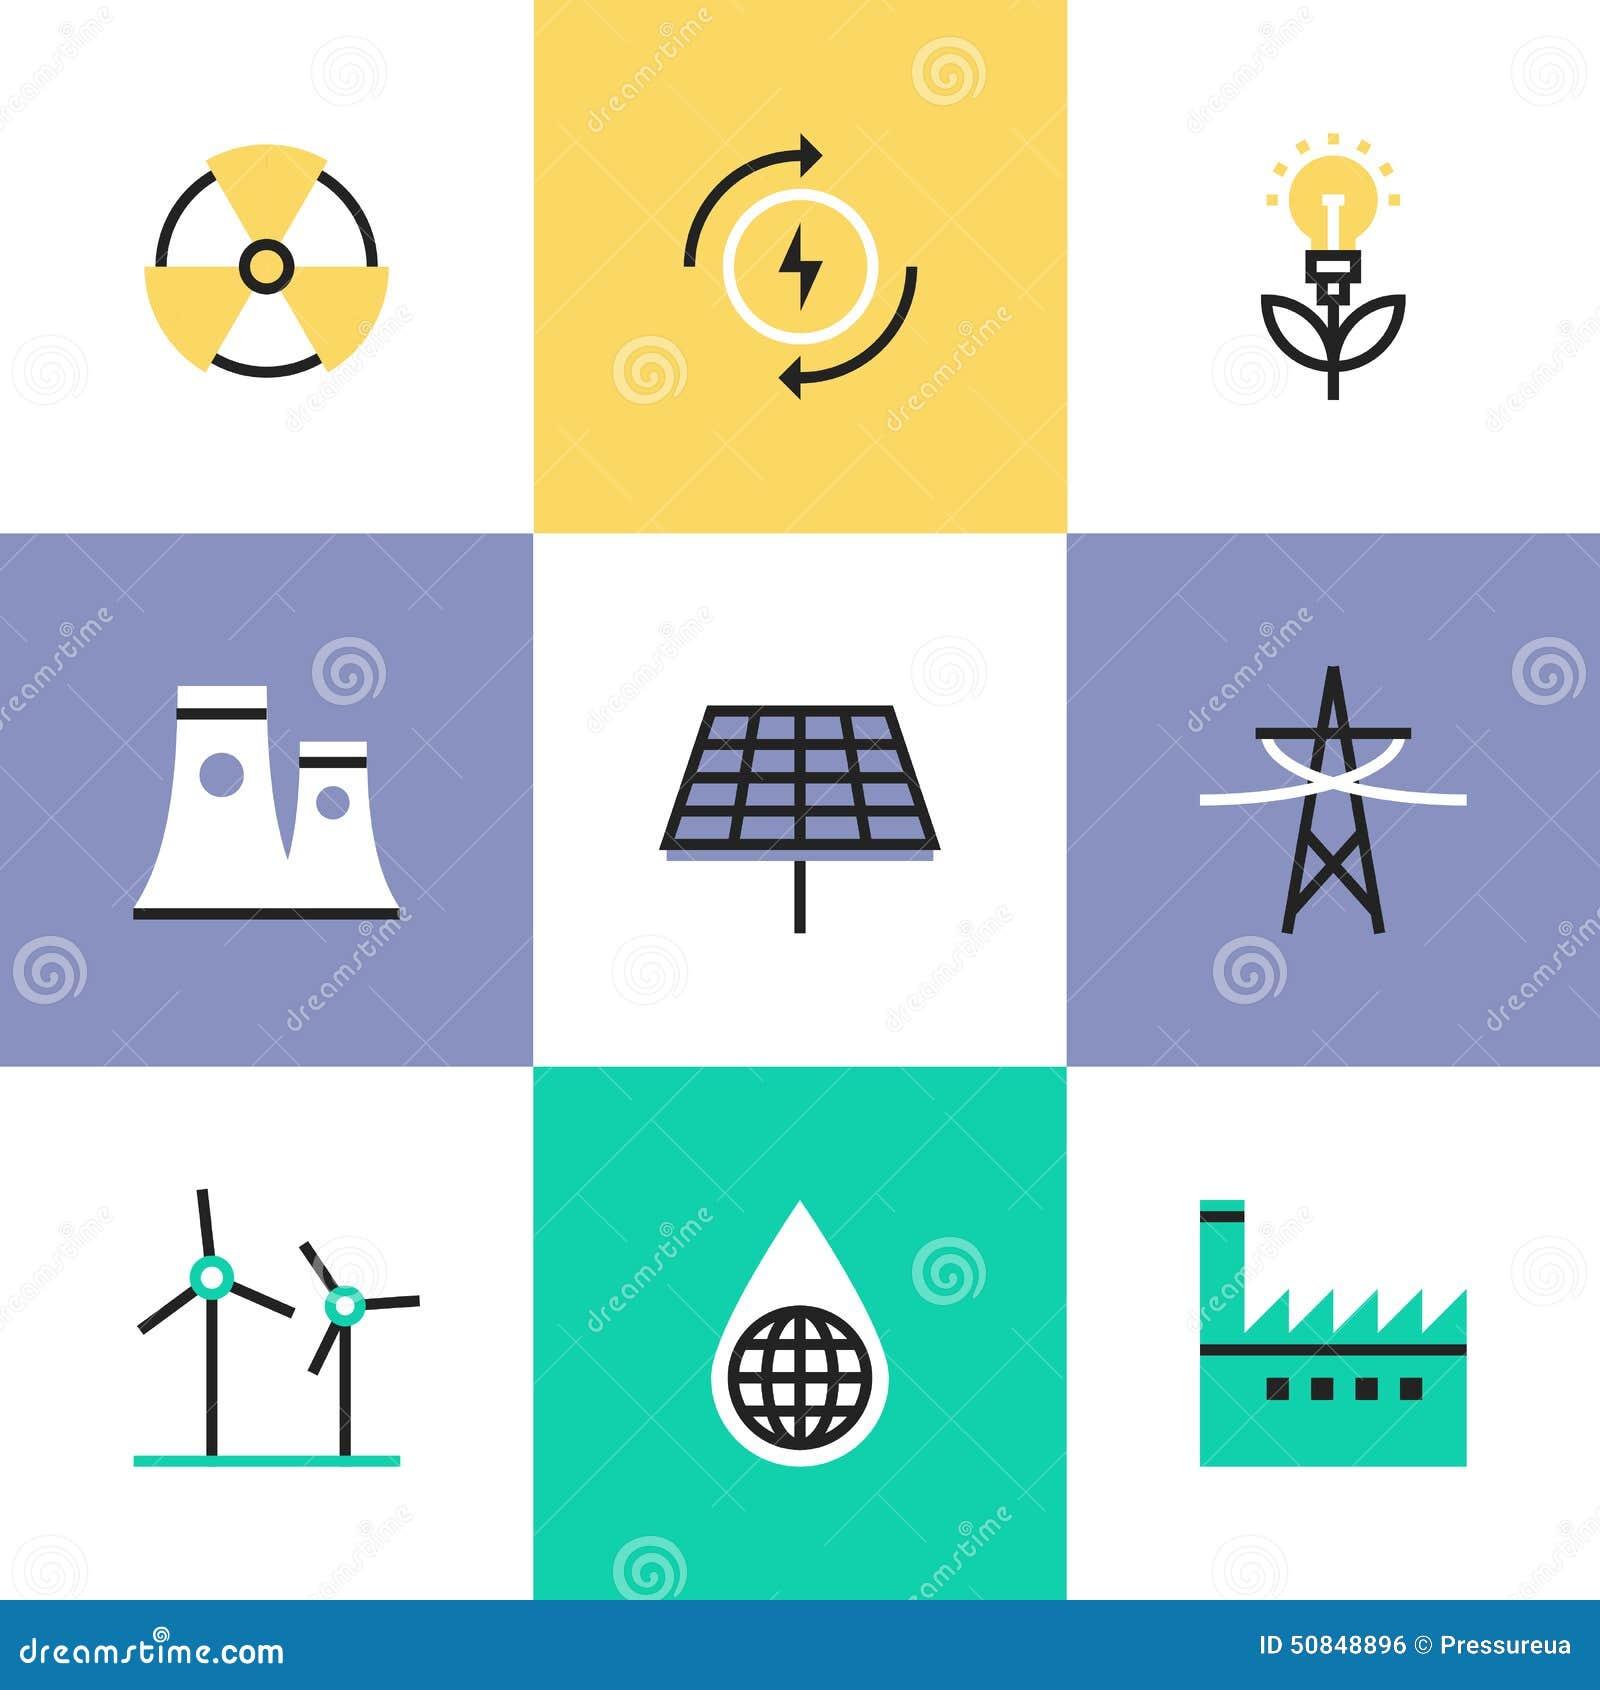 Renewable Energy Production Pictogram Icons Set Stock Vector - Image ...